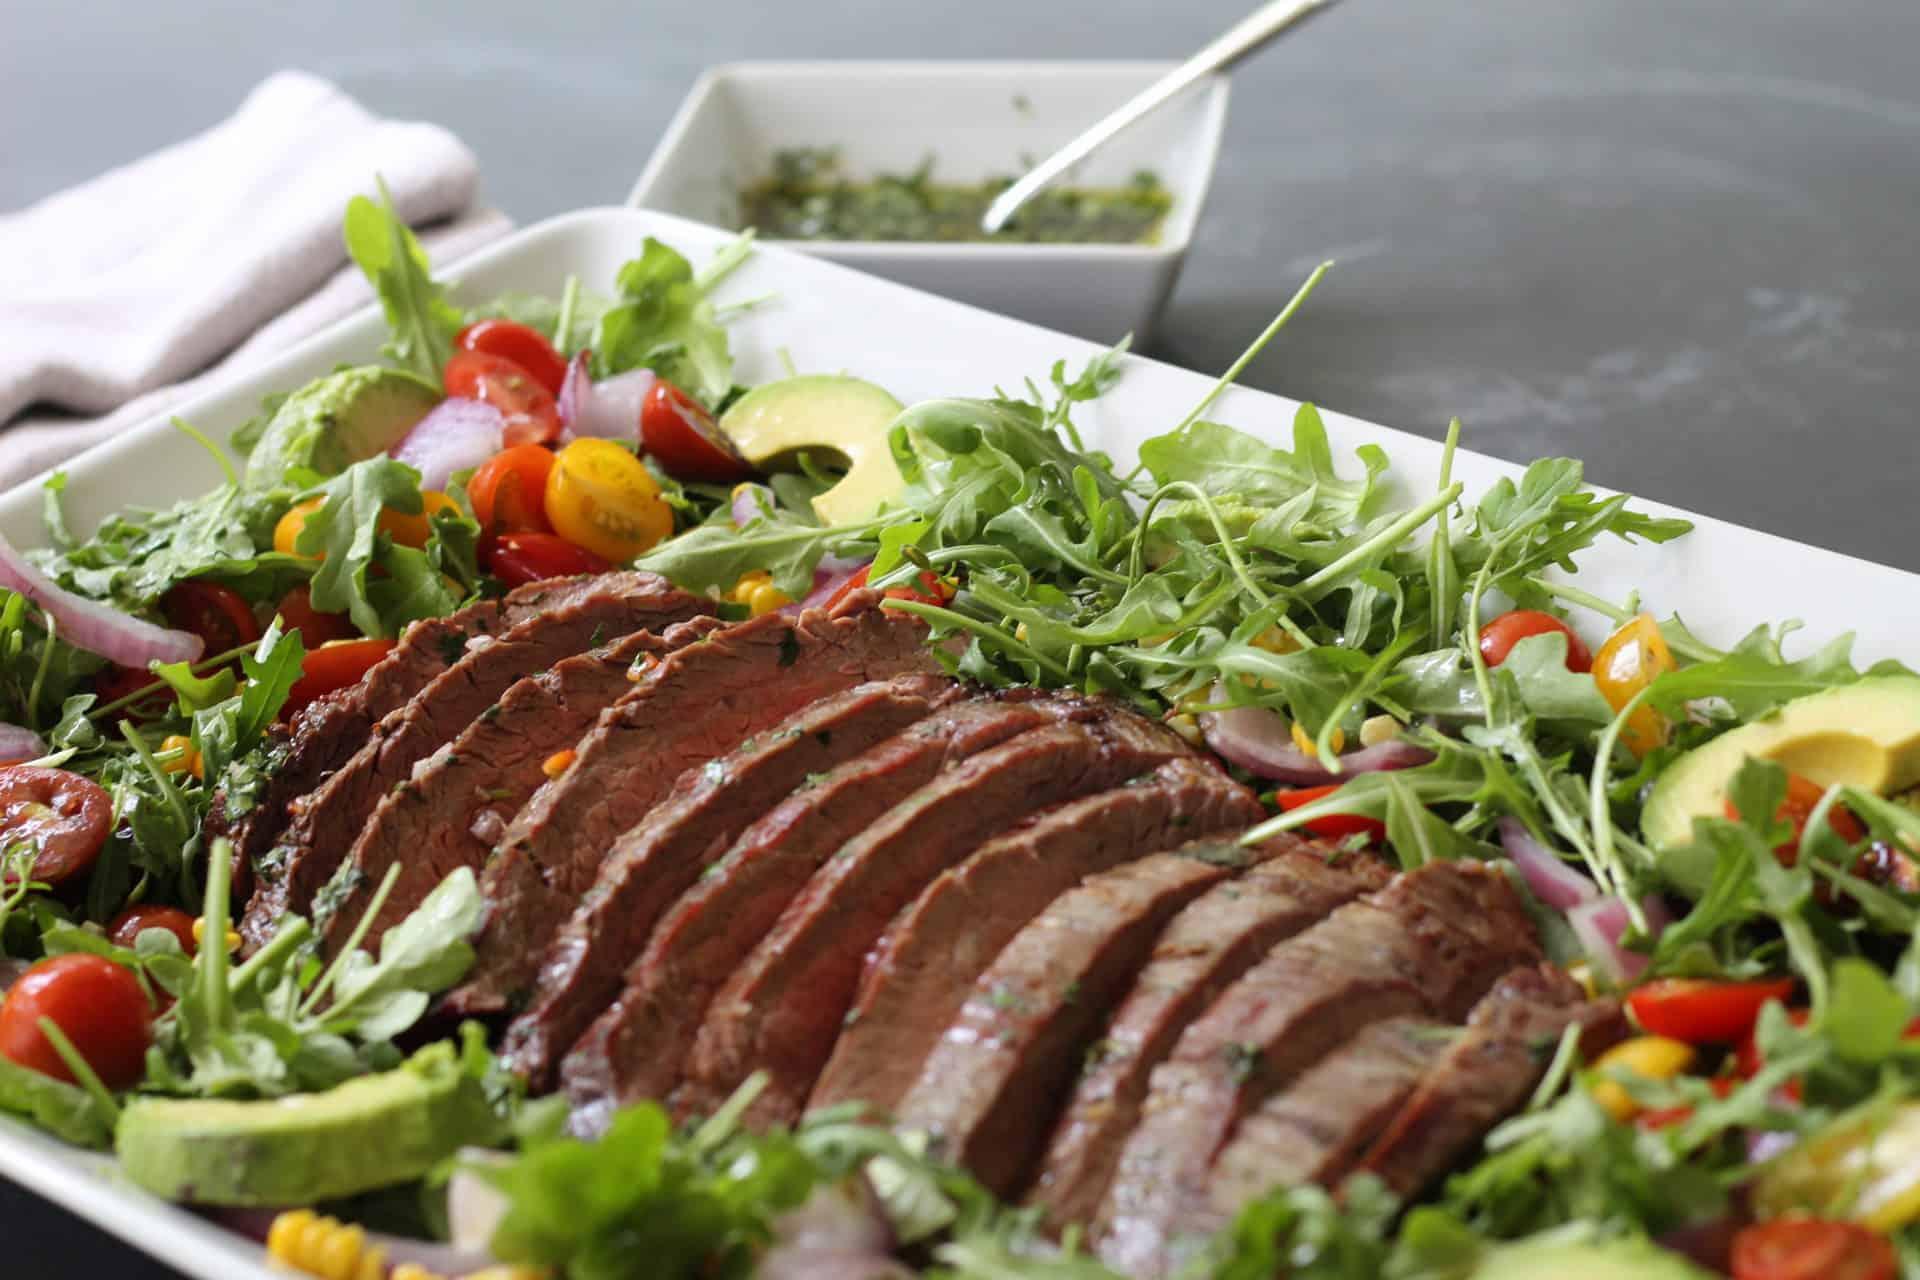 Salads, Summer, Steak, Meat, Grilled